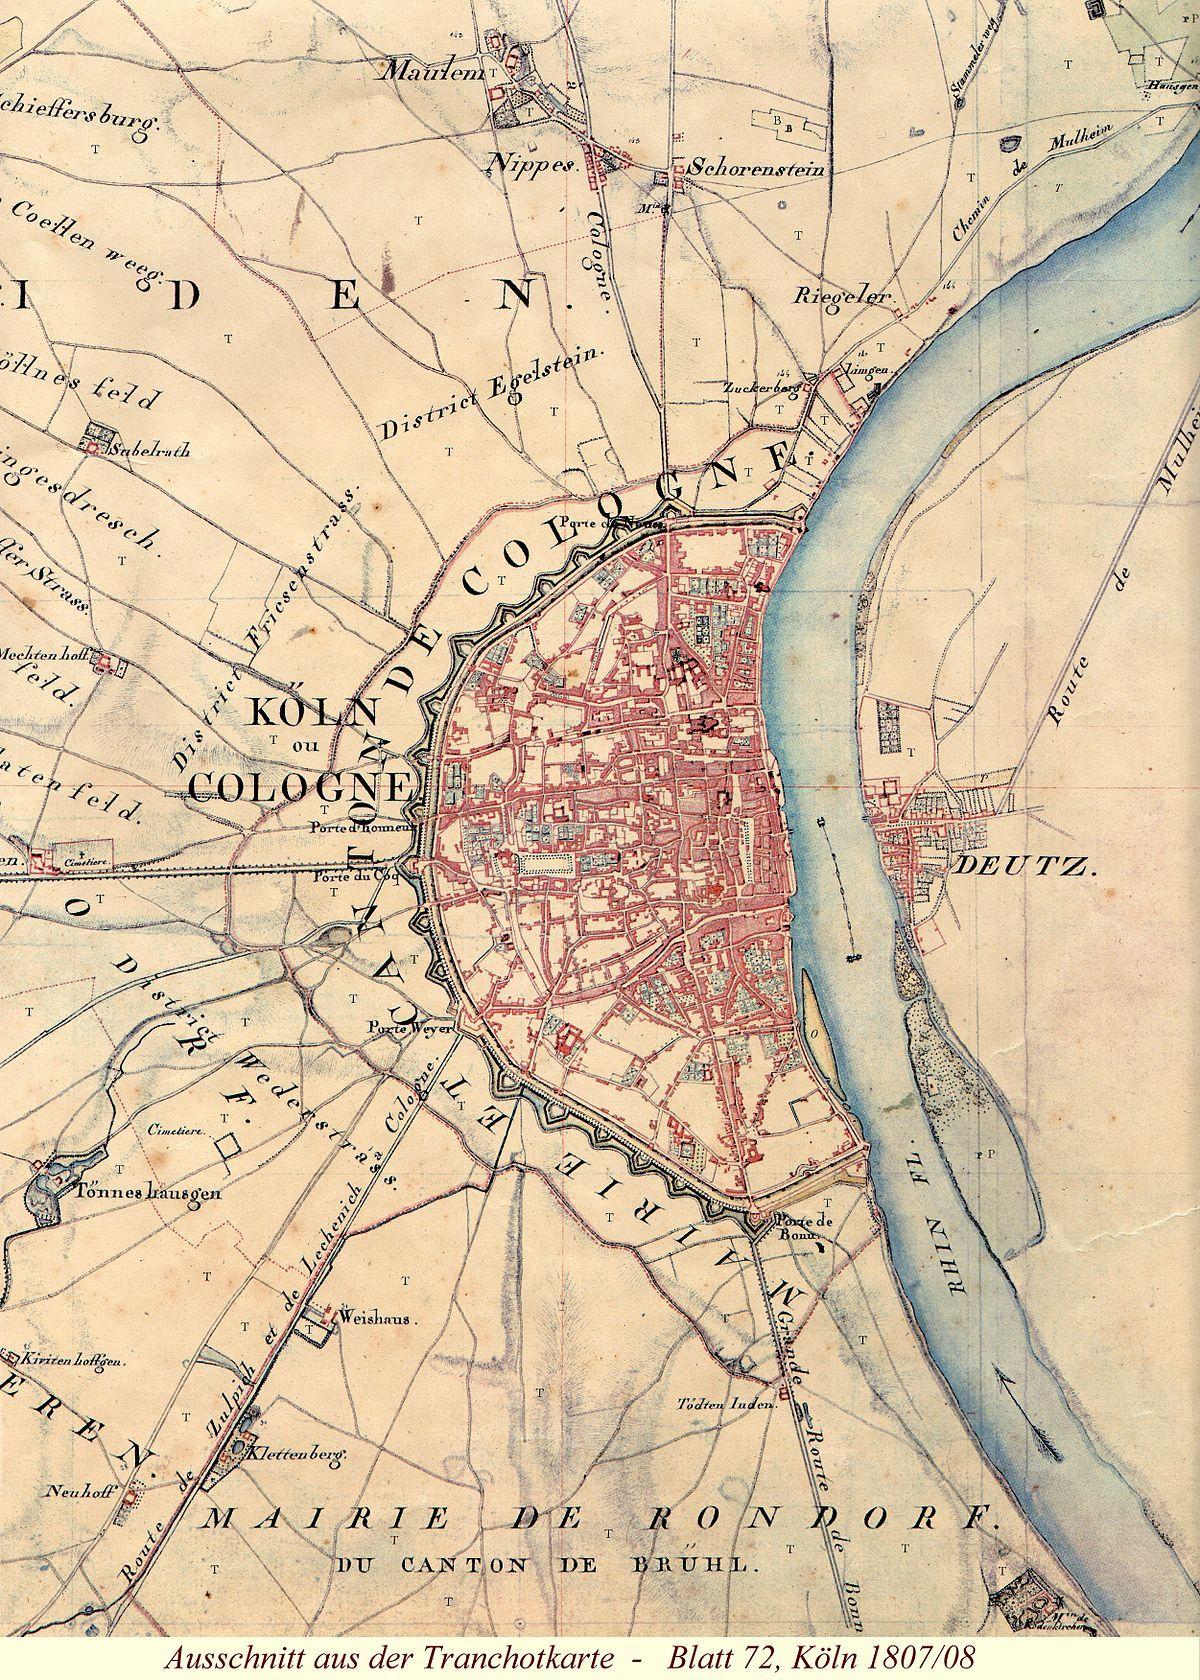 Kanton Koln Wikipedia Koln Karte Historische Karten Landkarte